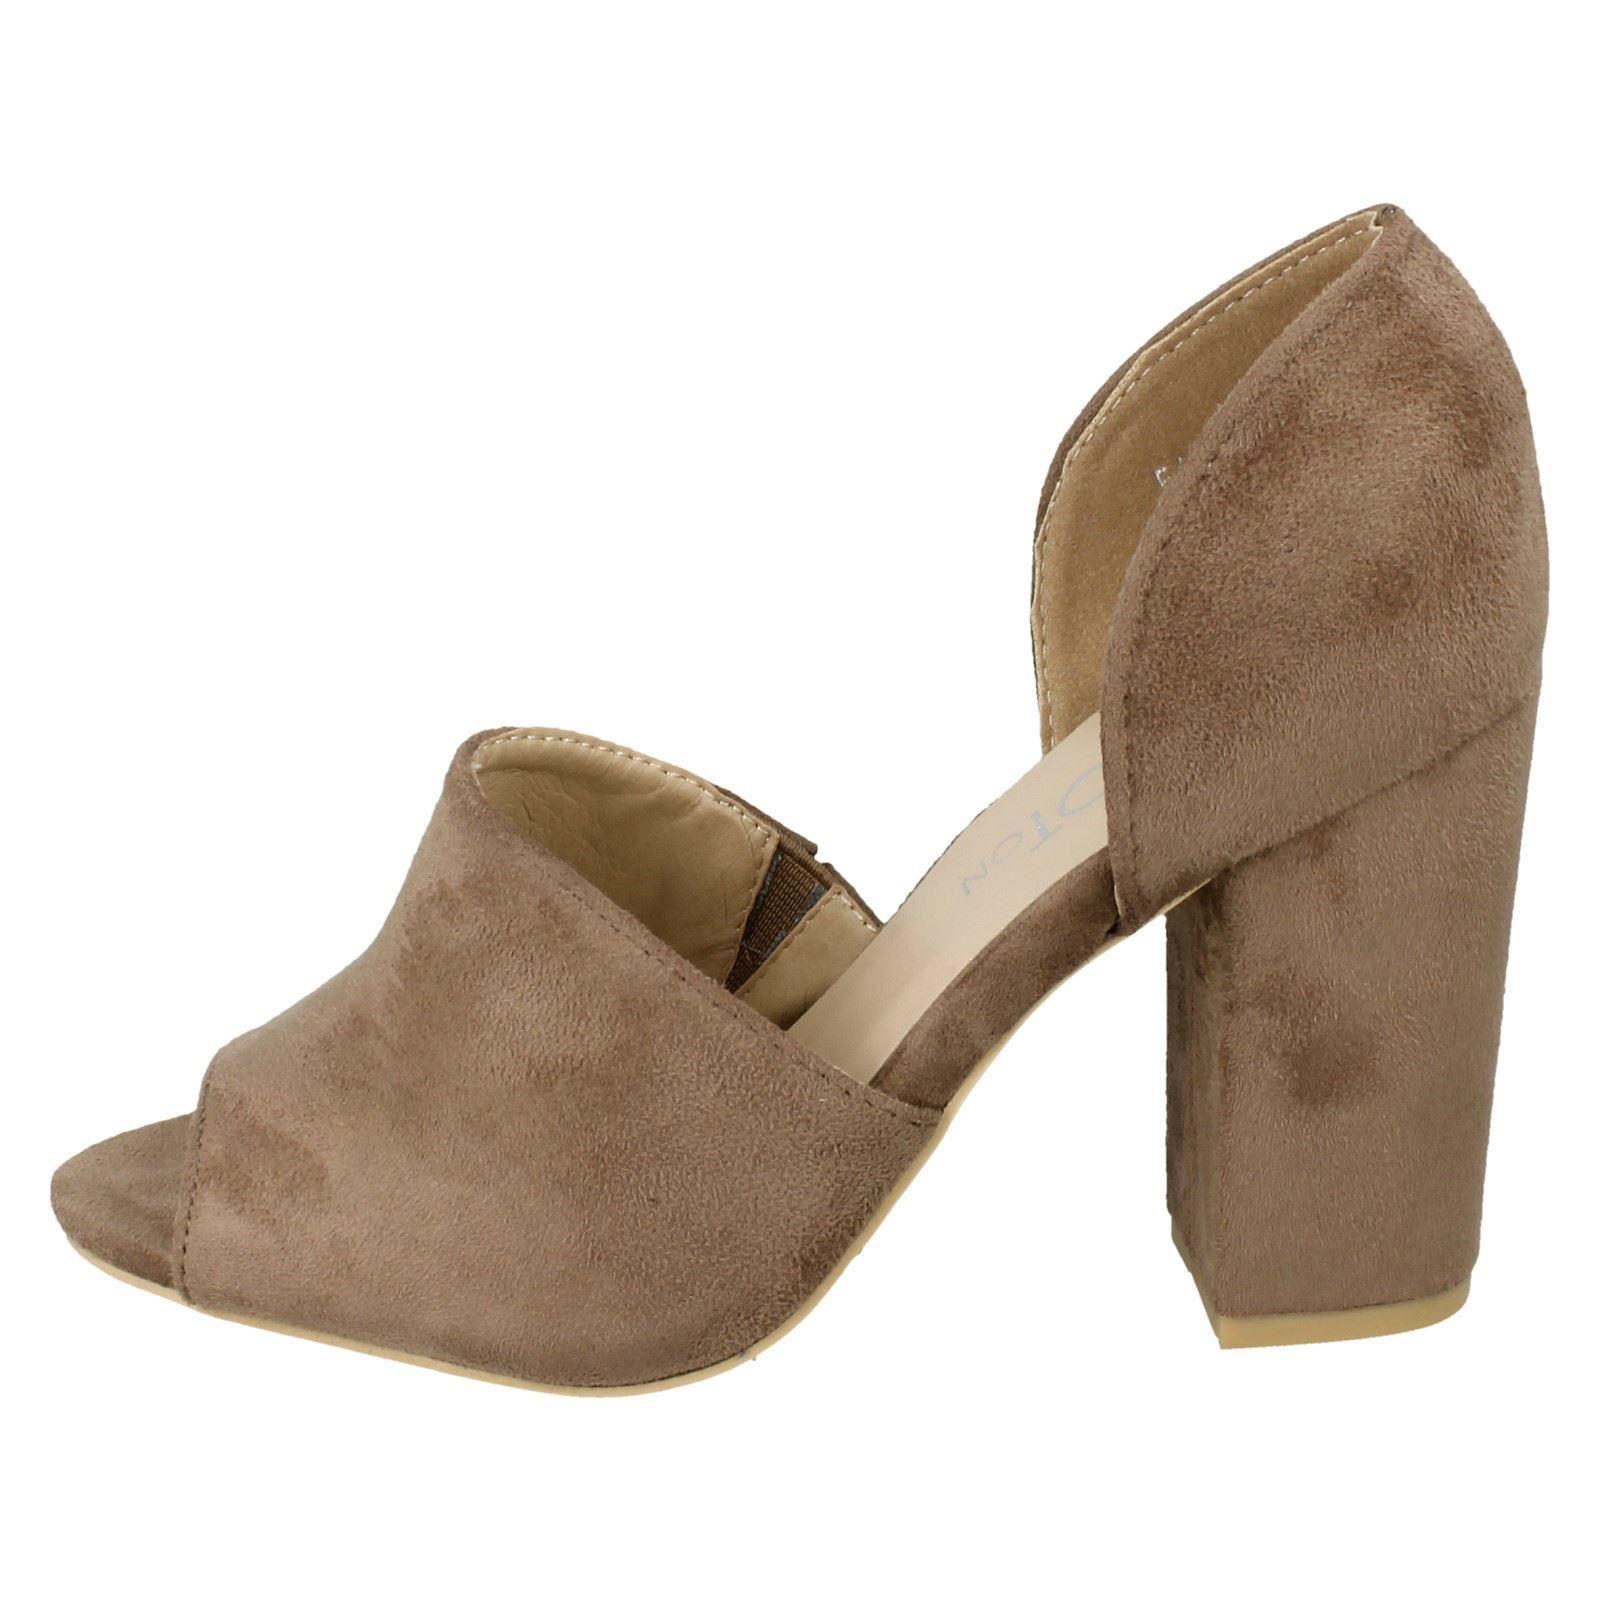 Femmes Spot on Haute à Talon bottier Mule Sandale